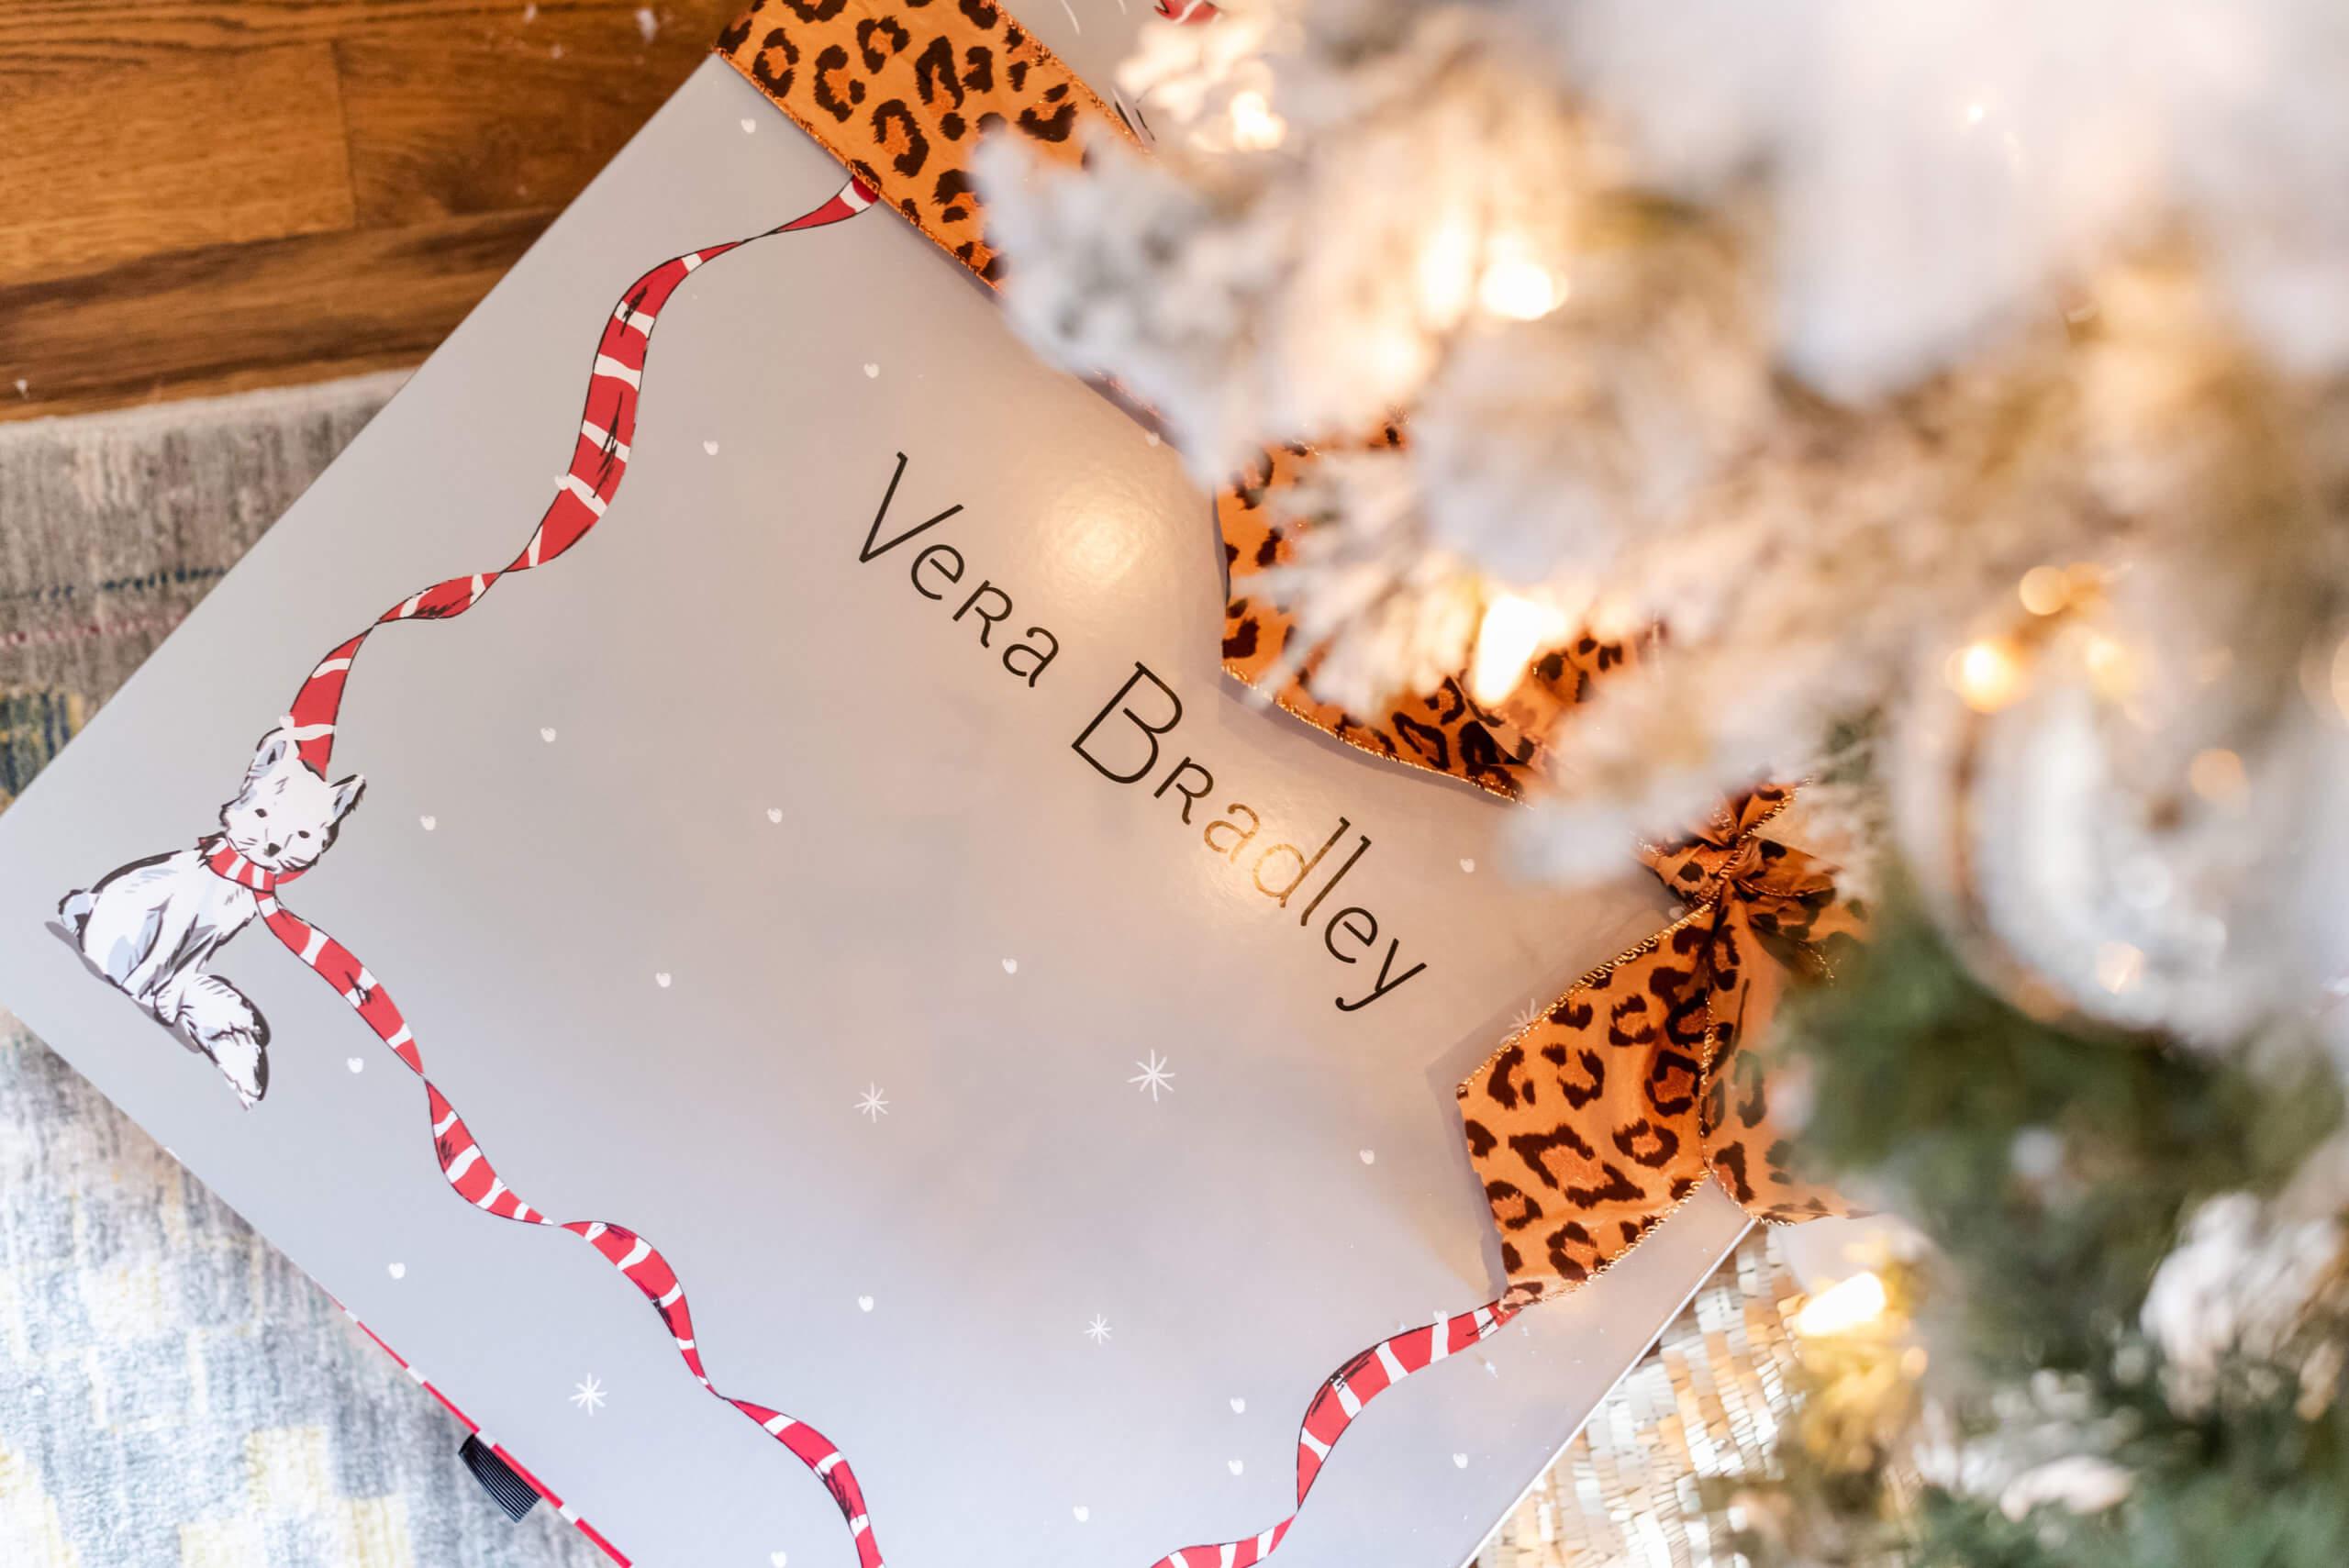 vera bradley holiday gift, vera bradley weekender bag, style your senses